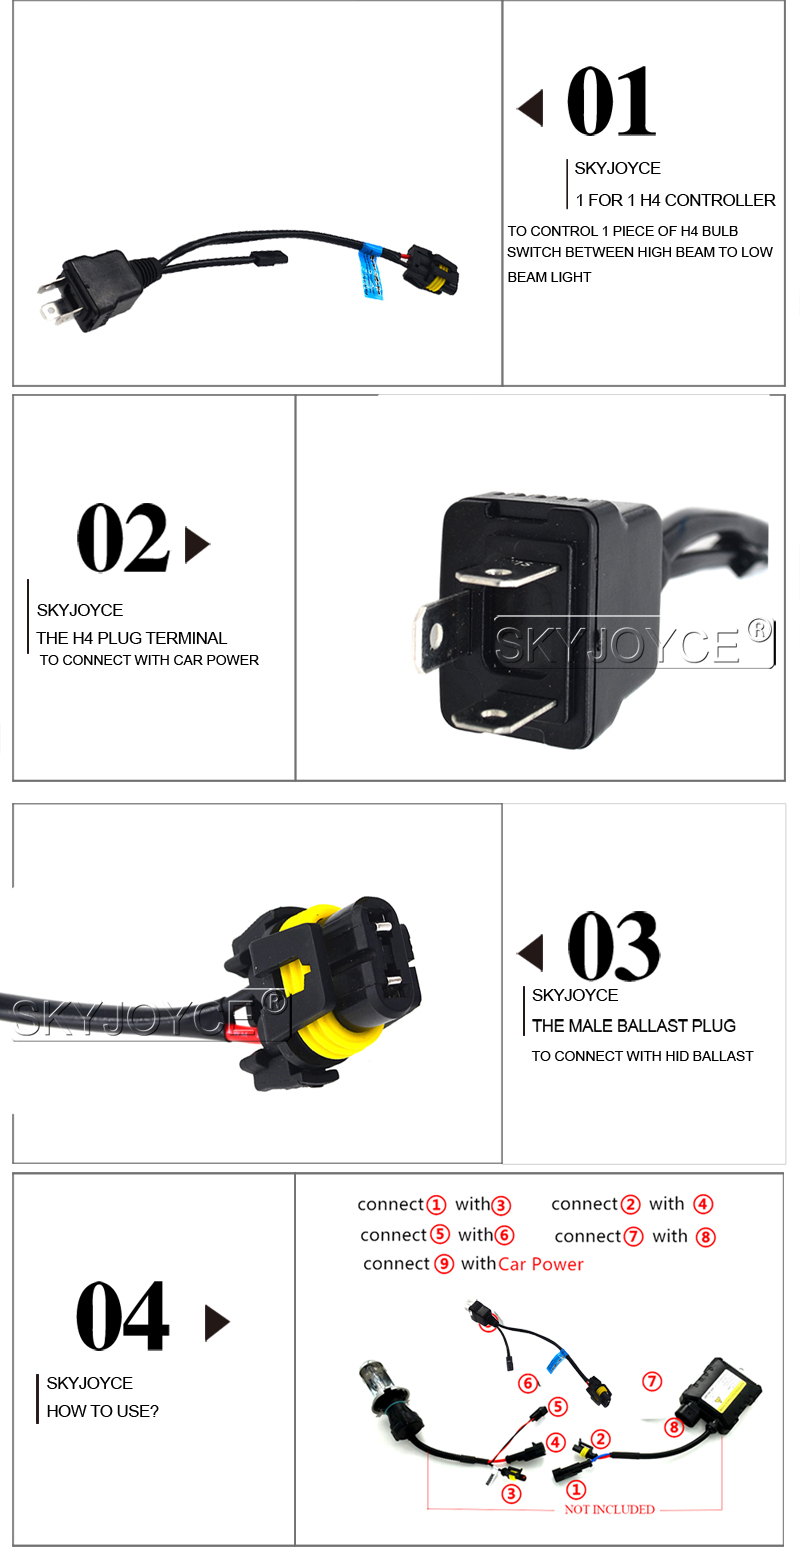 Skyjoyce Bixenon H4 Relay Harness Cable Controller 35w 55w 4300k Power Hid 5000k Hi Lo